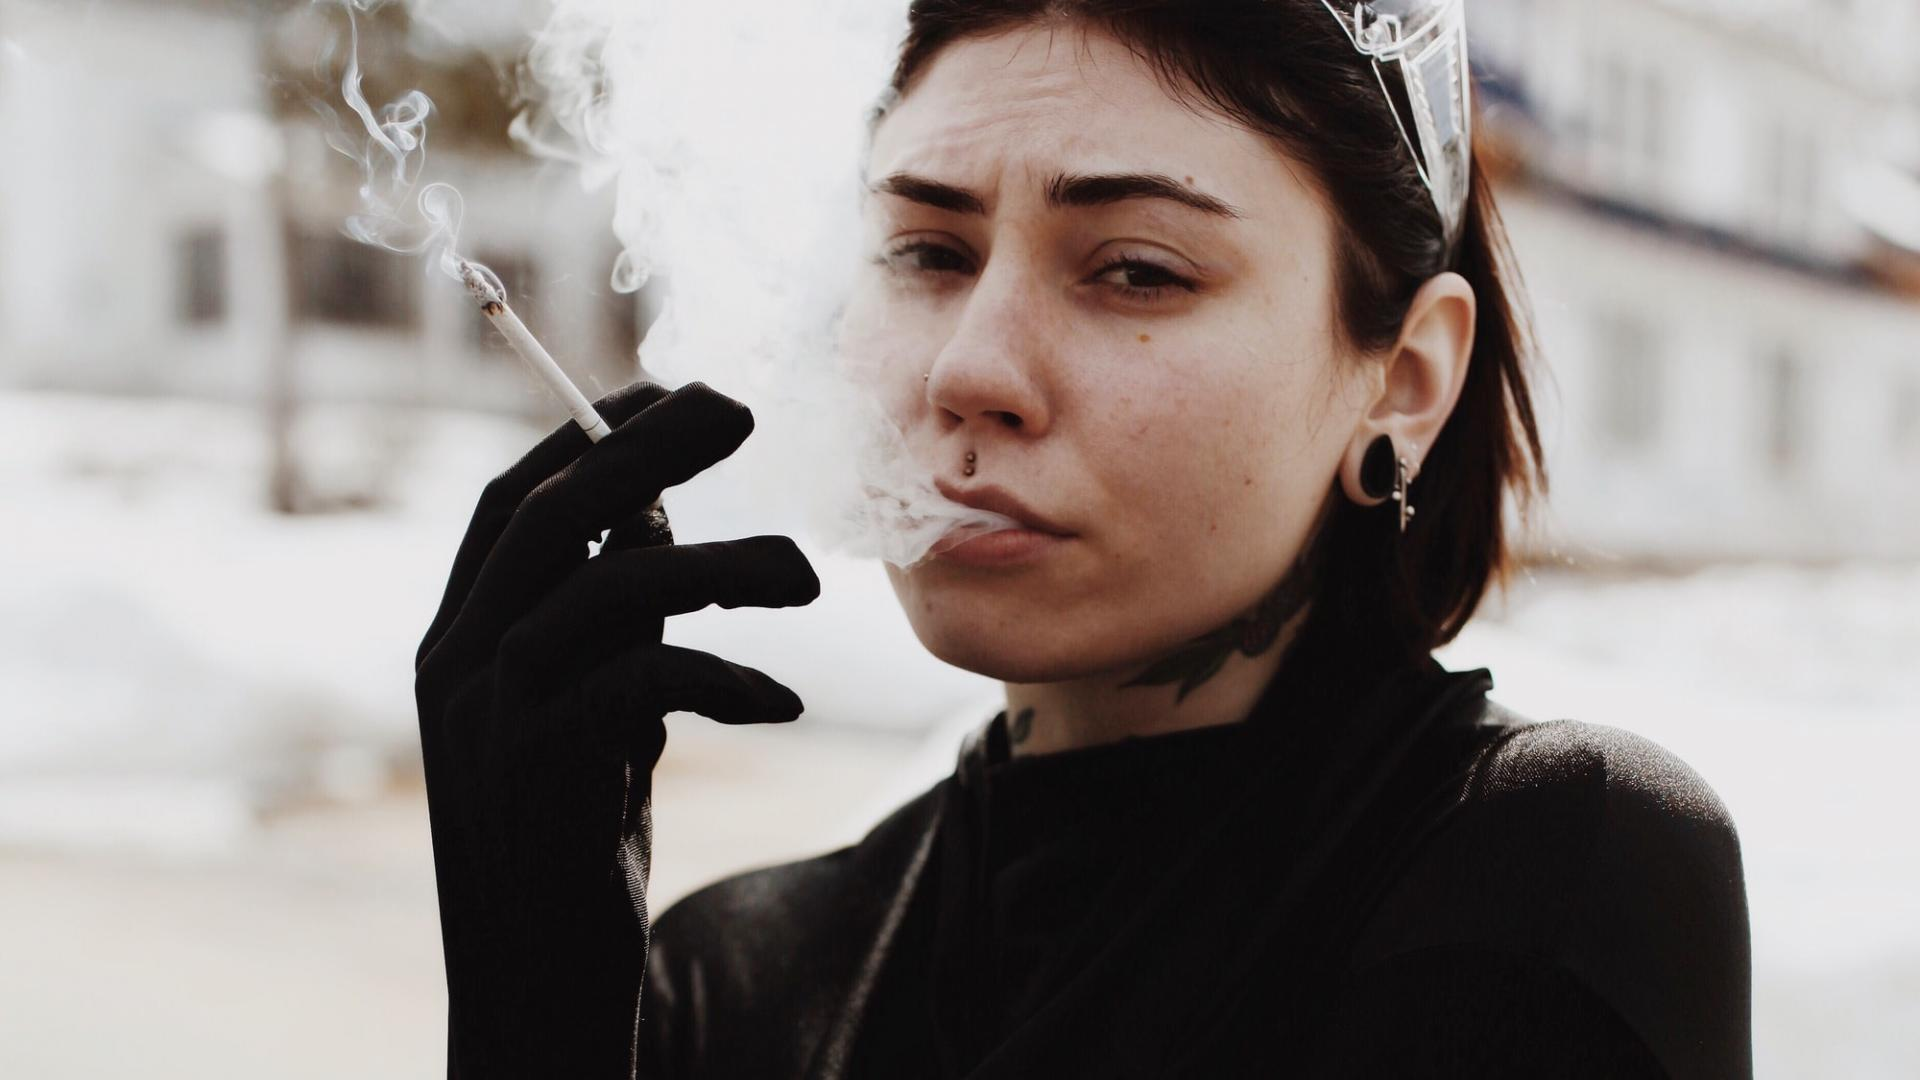 Ist E Zigarette Gesünder Als Normale Zigarette